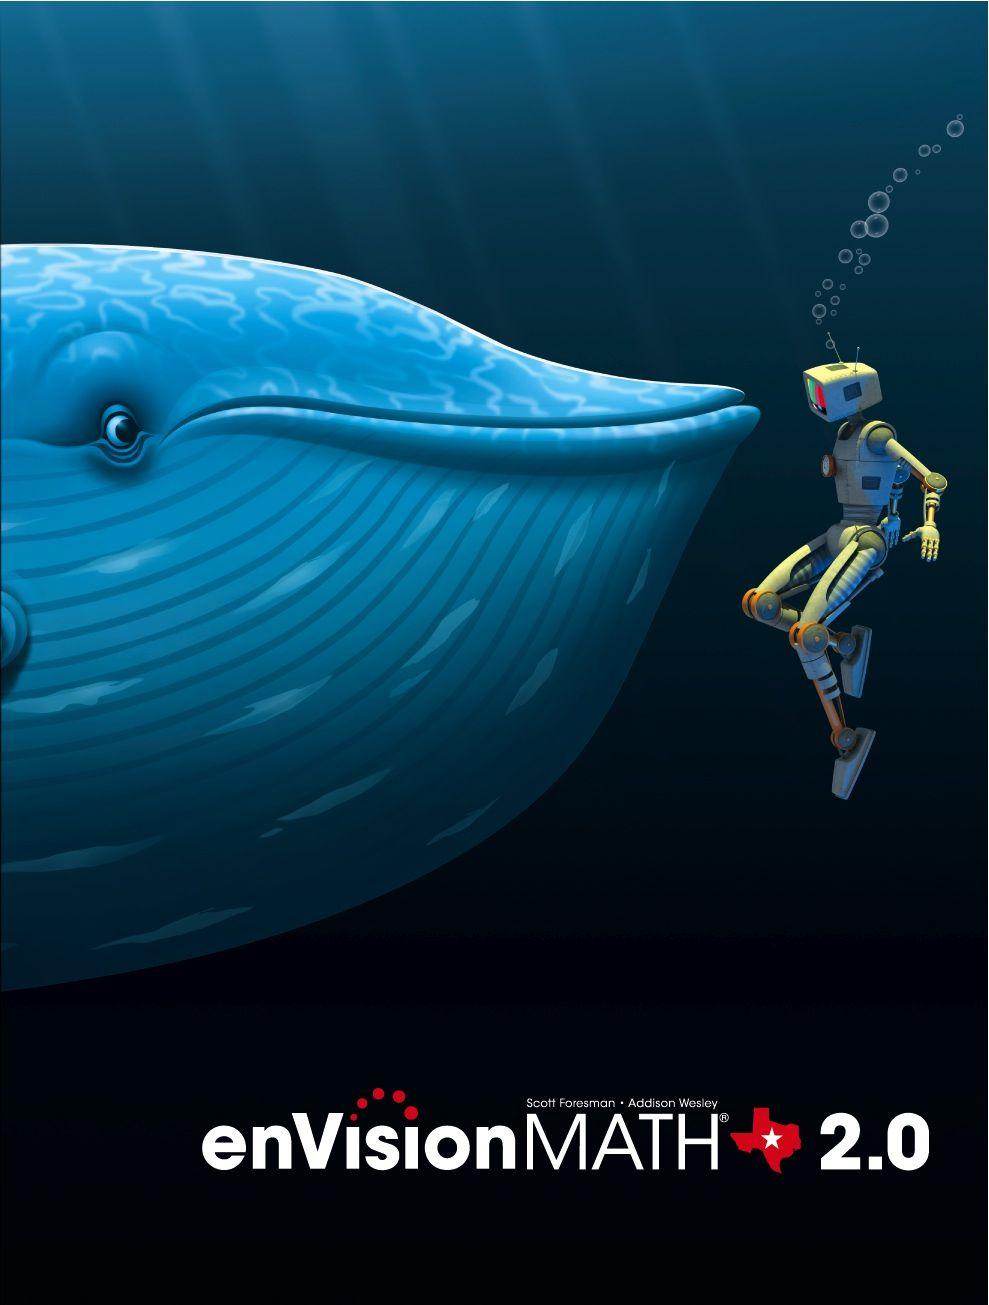 enVisionMATH - Student Edition - Grade 5 - Pearson Texas   Envision math [ 1305 x 989 Pixel ]